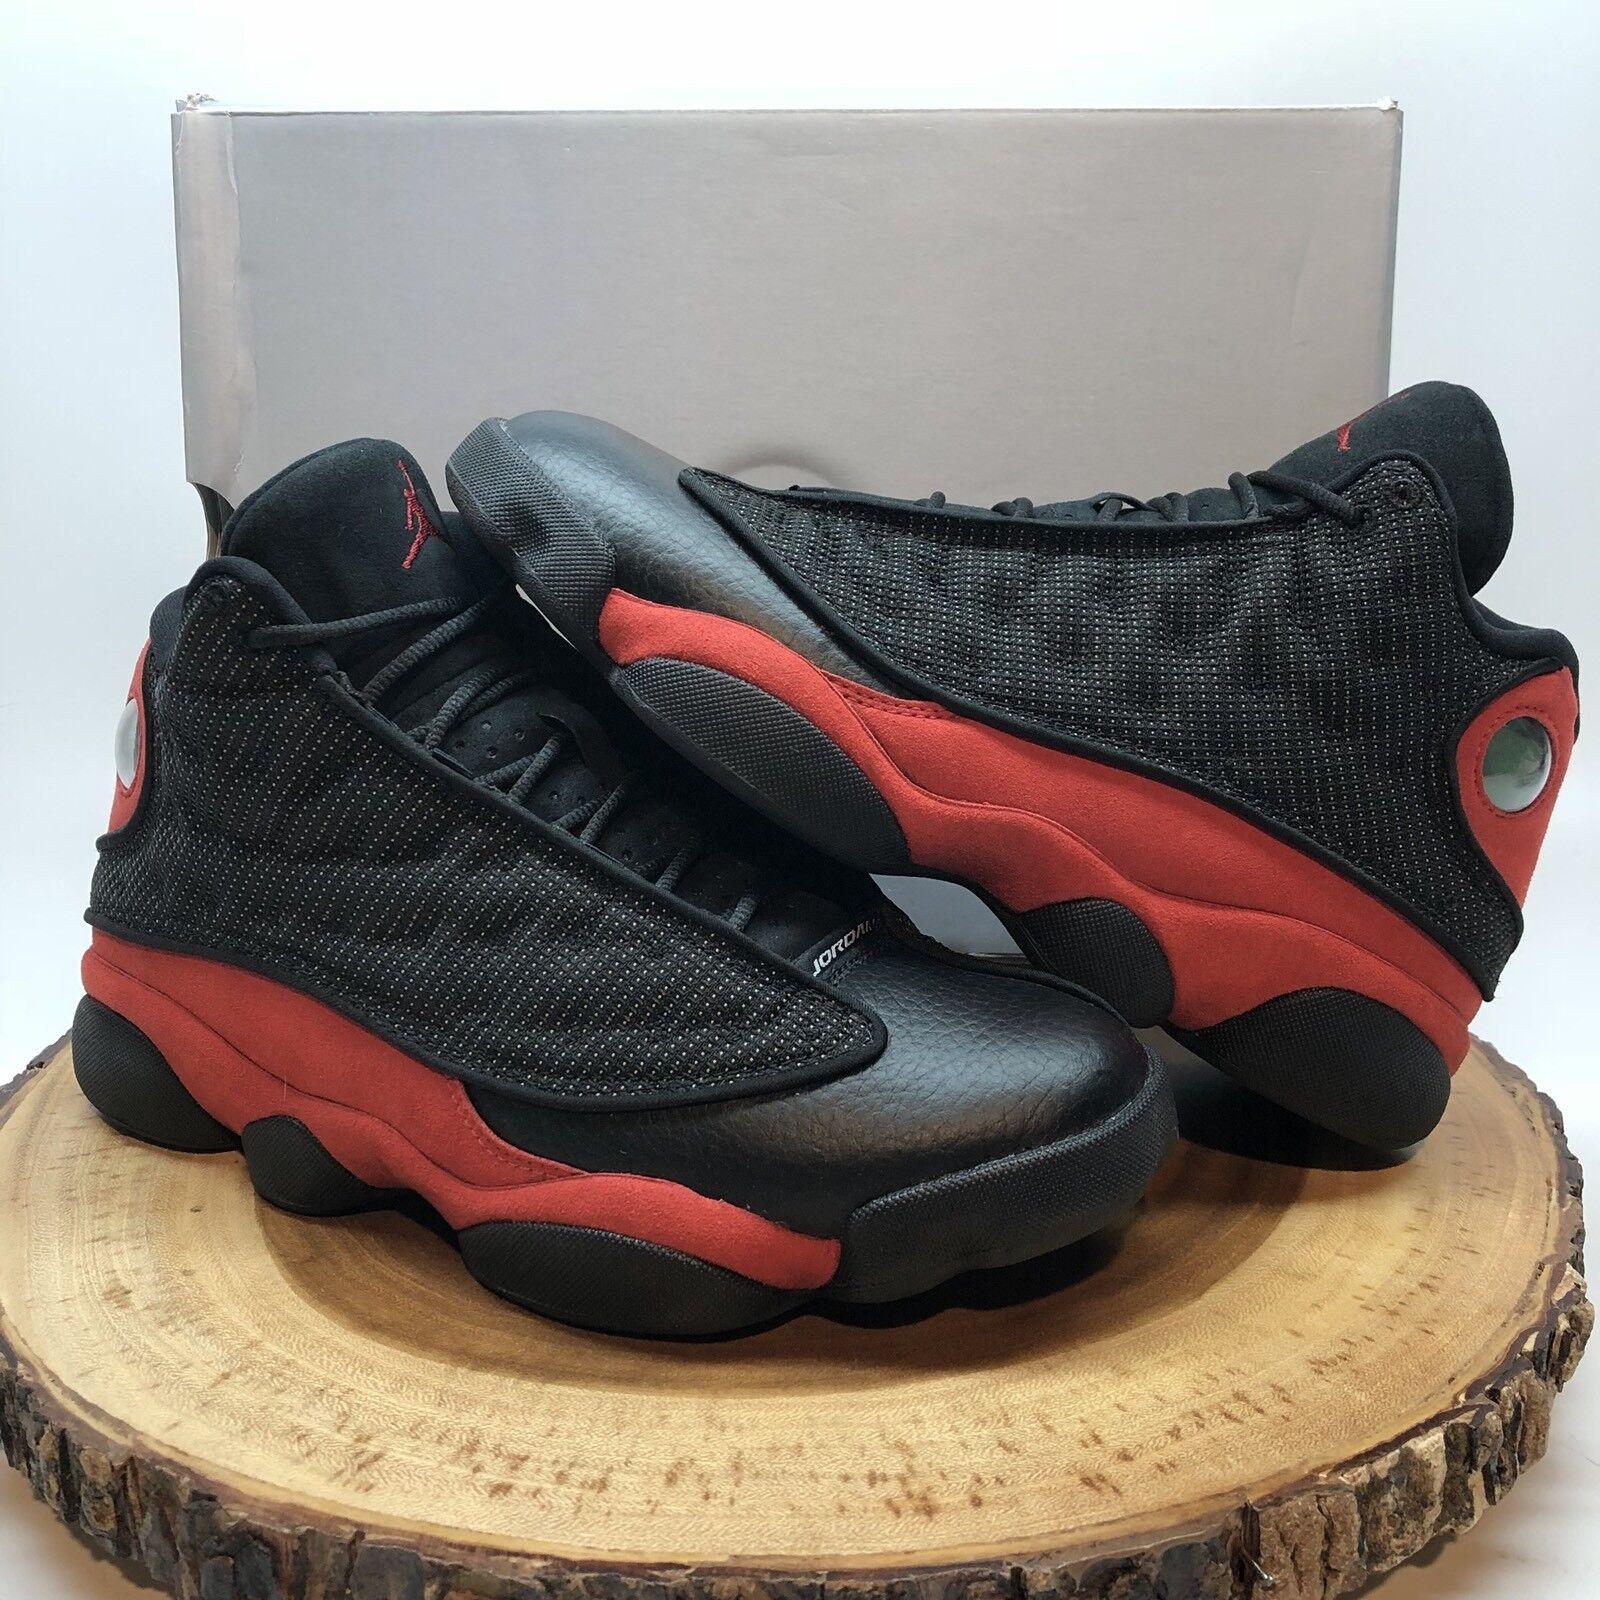 Nike Air Jordan Retro XIII Bred Black Red 3M 414571 004 Size 9.5 Bulls XII XI X